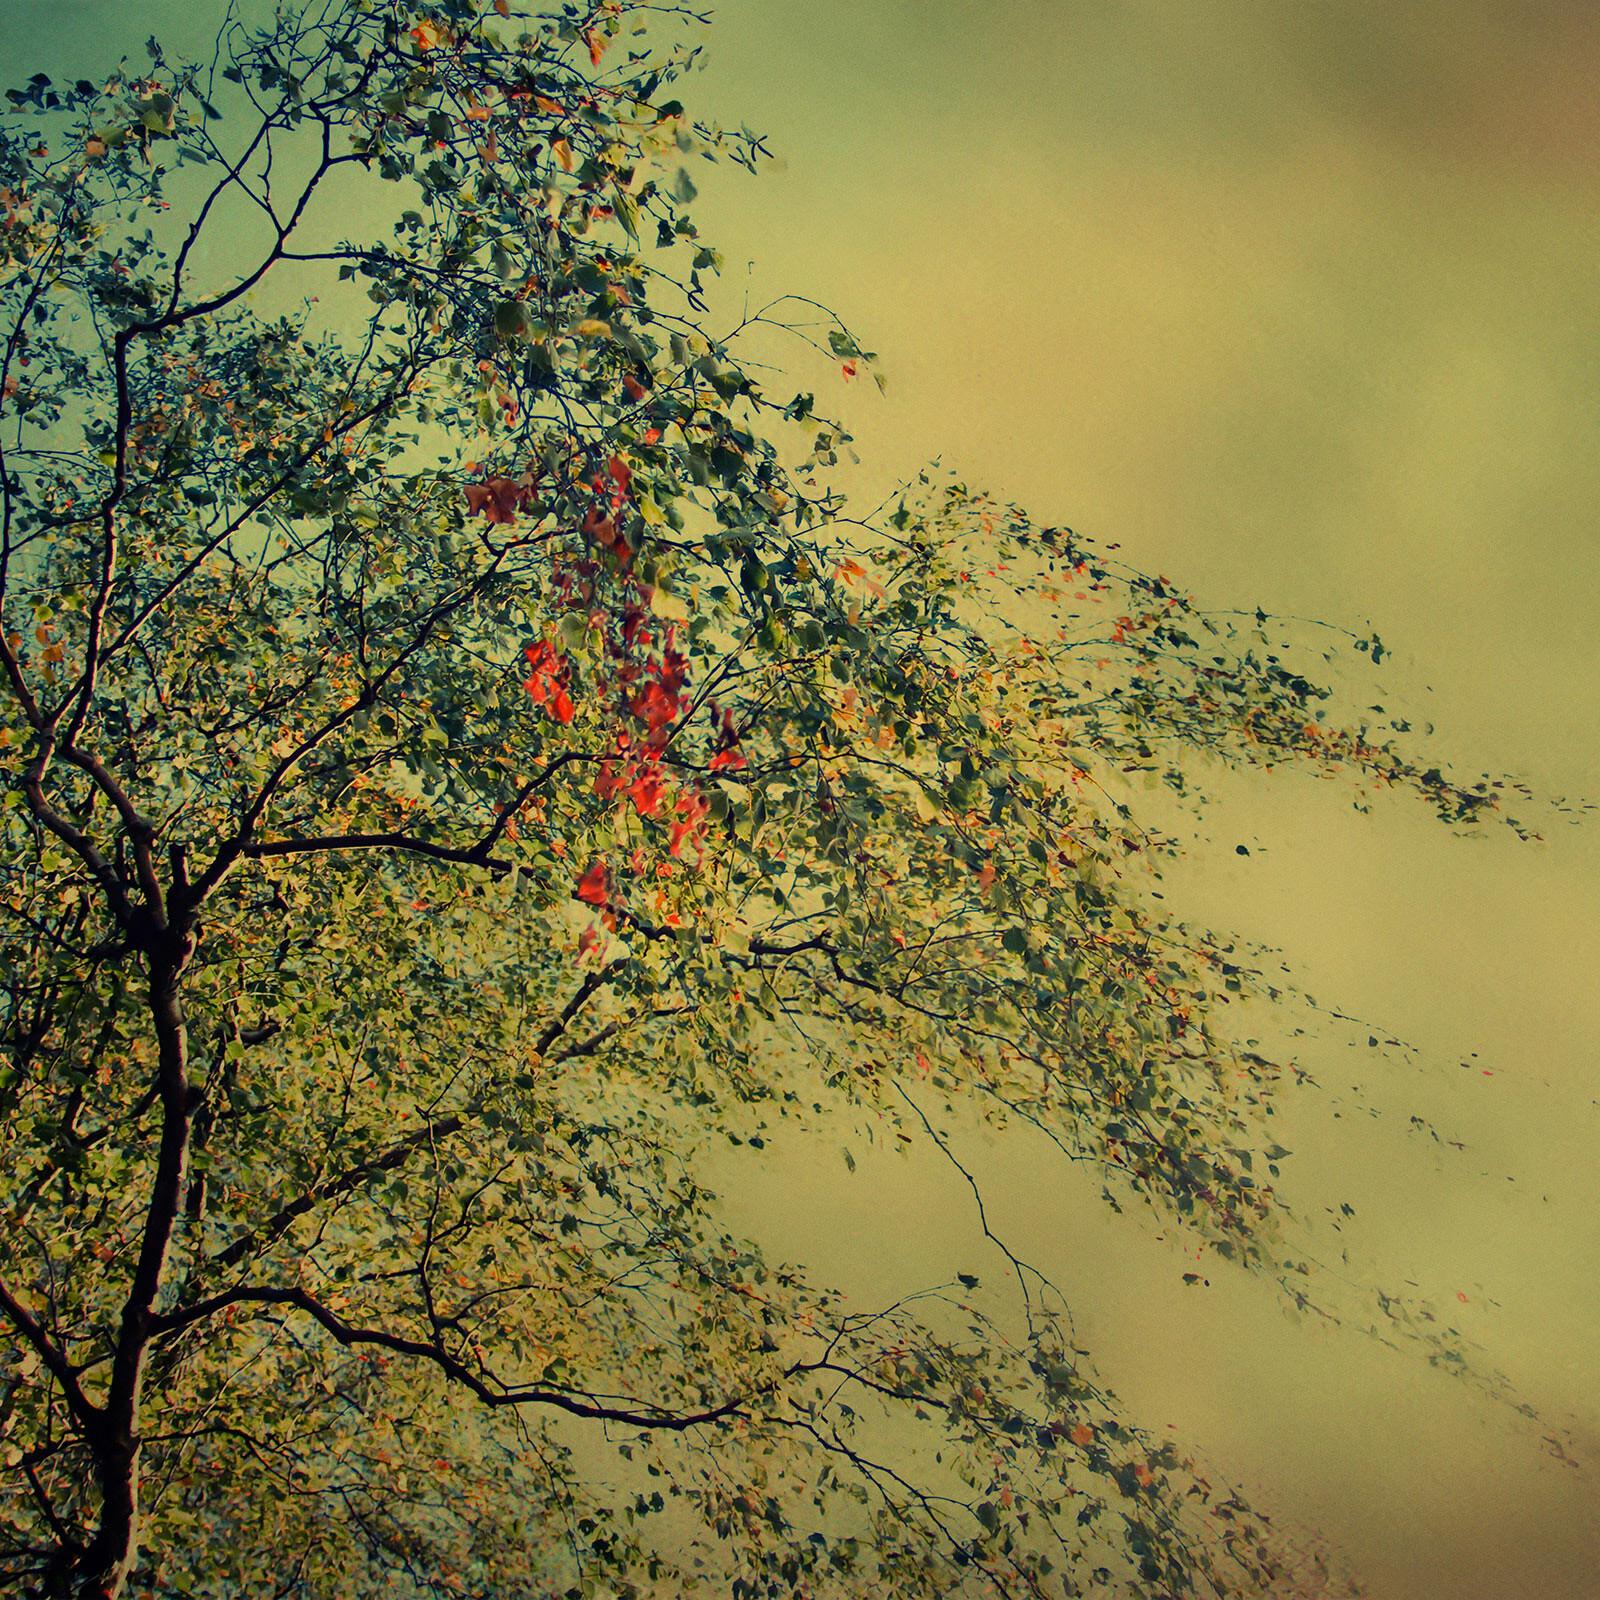 The Autumnal Whisper - Christiane Steinicke